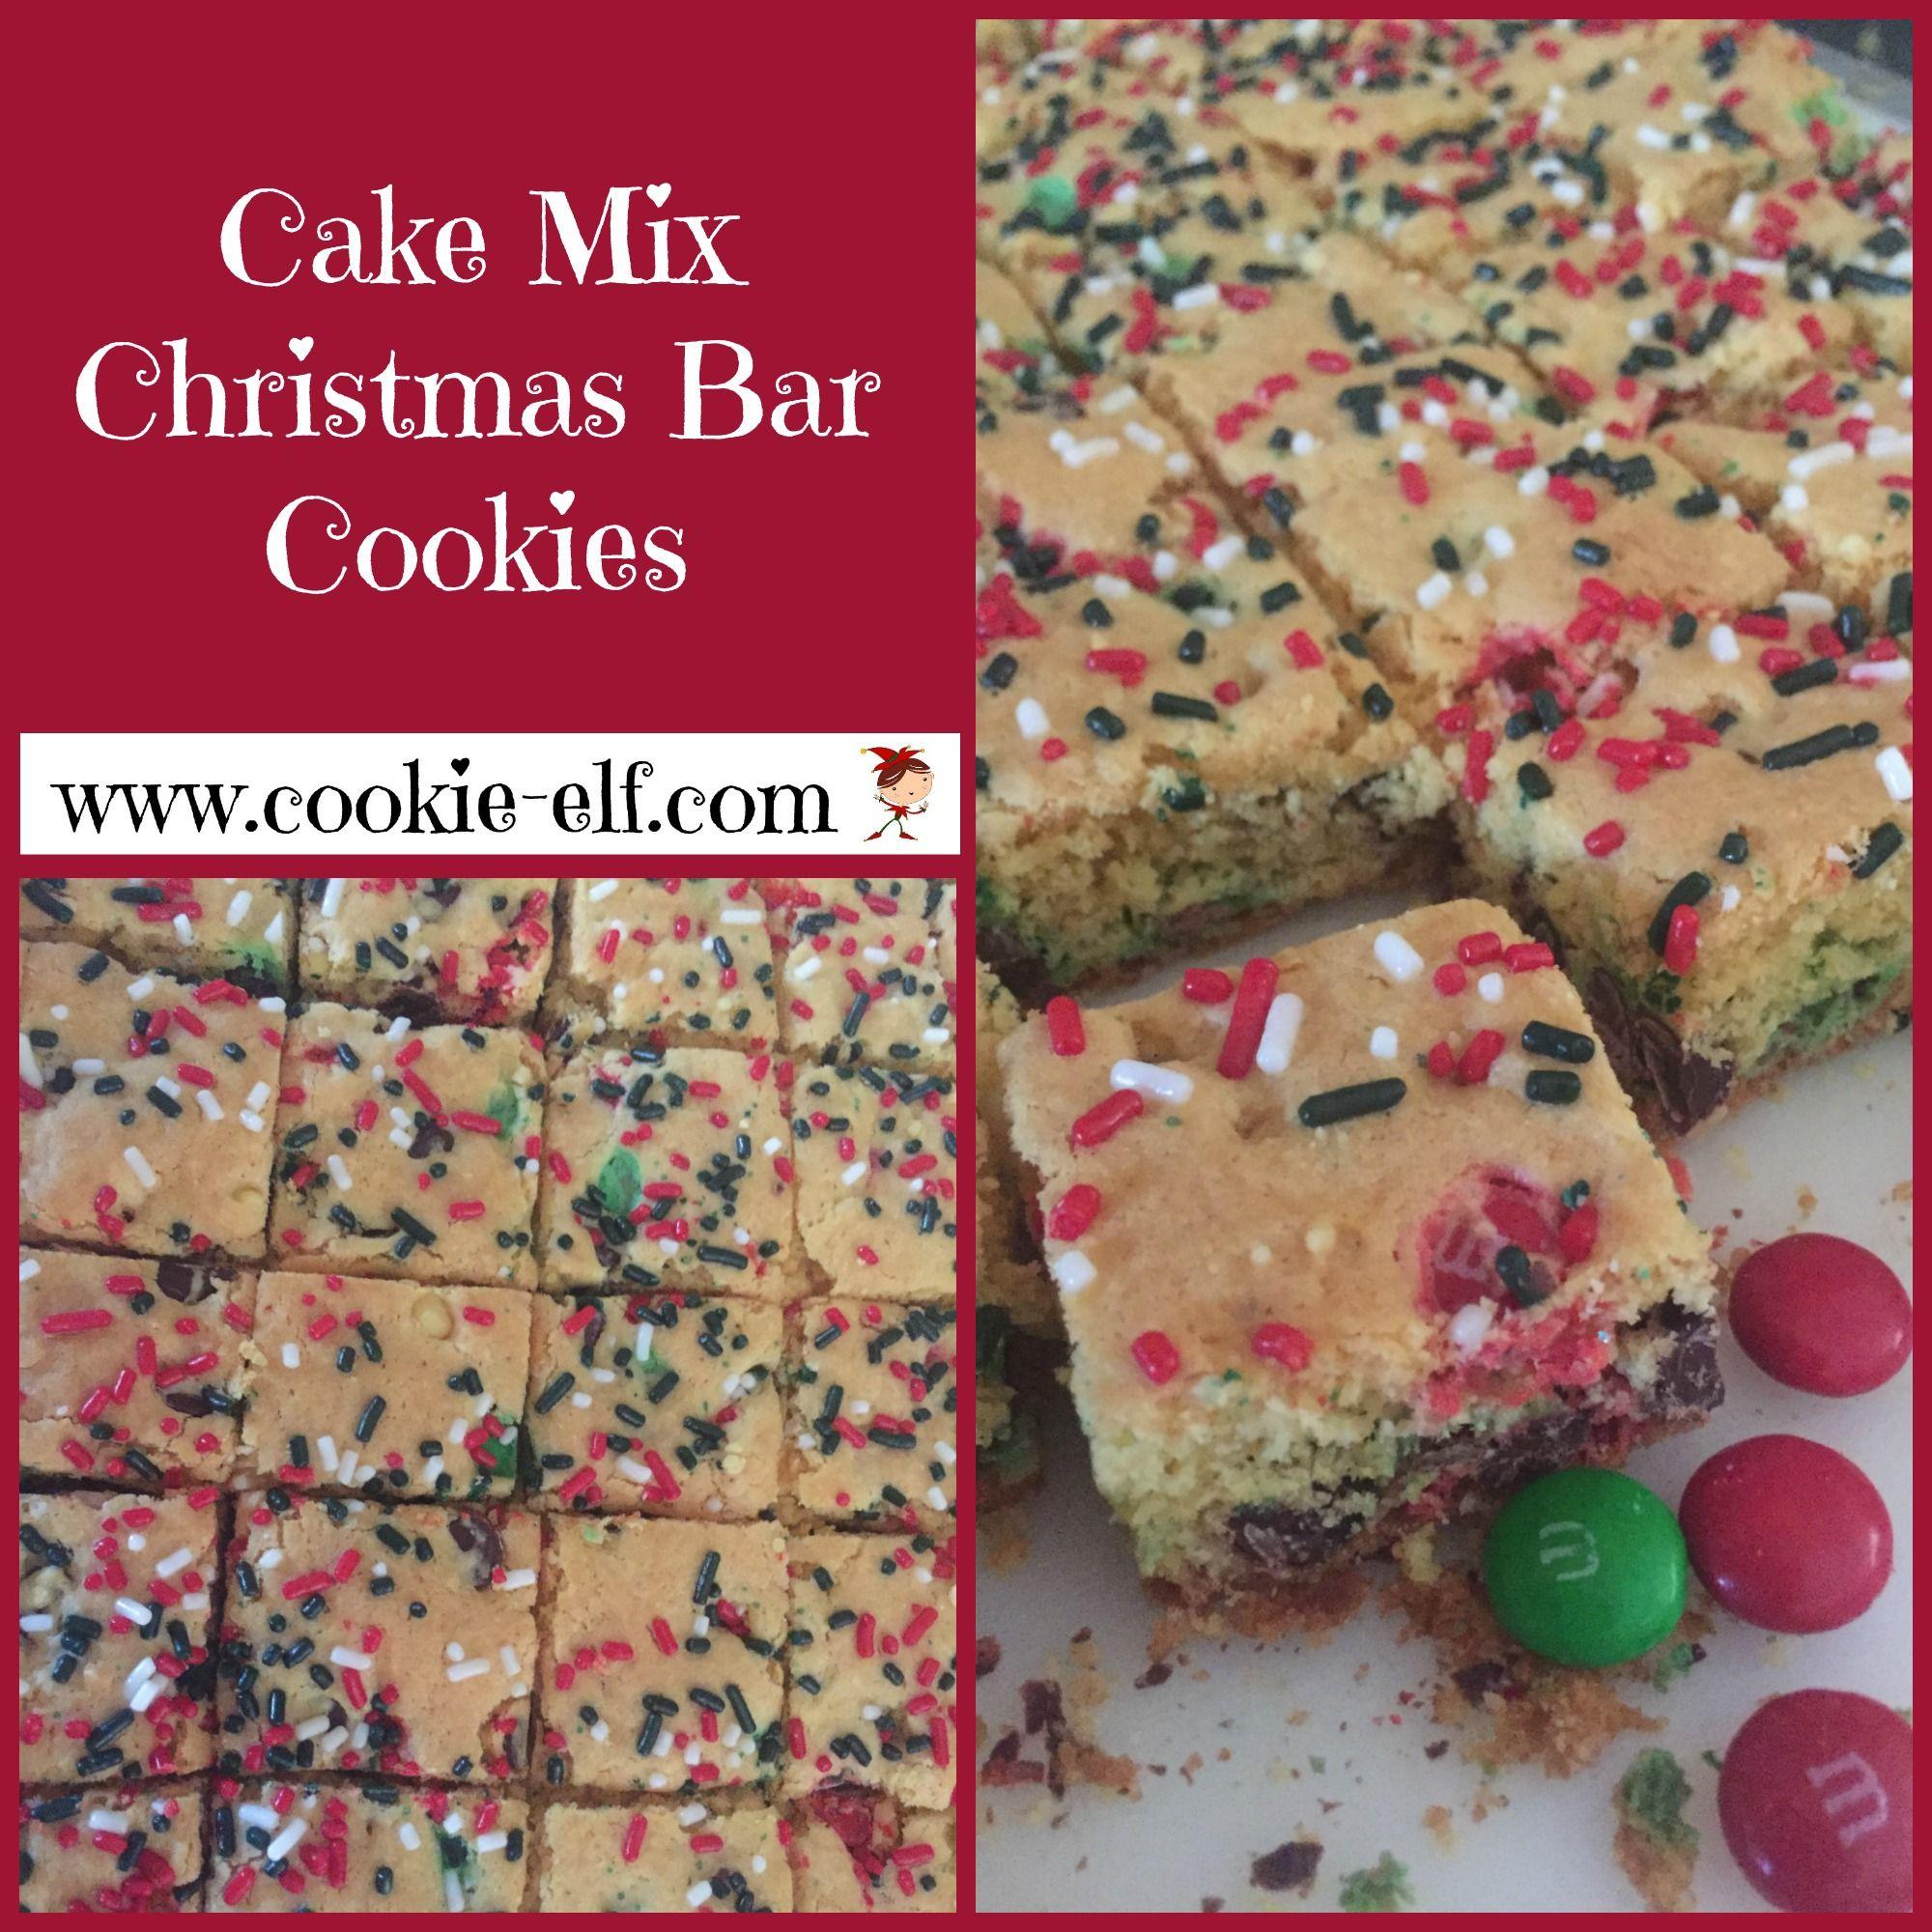 Cake Mix Christmas Bar Cookies Just 6 Ingredients In 2019 Bake